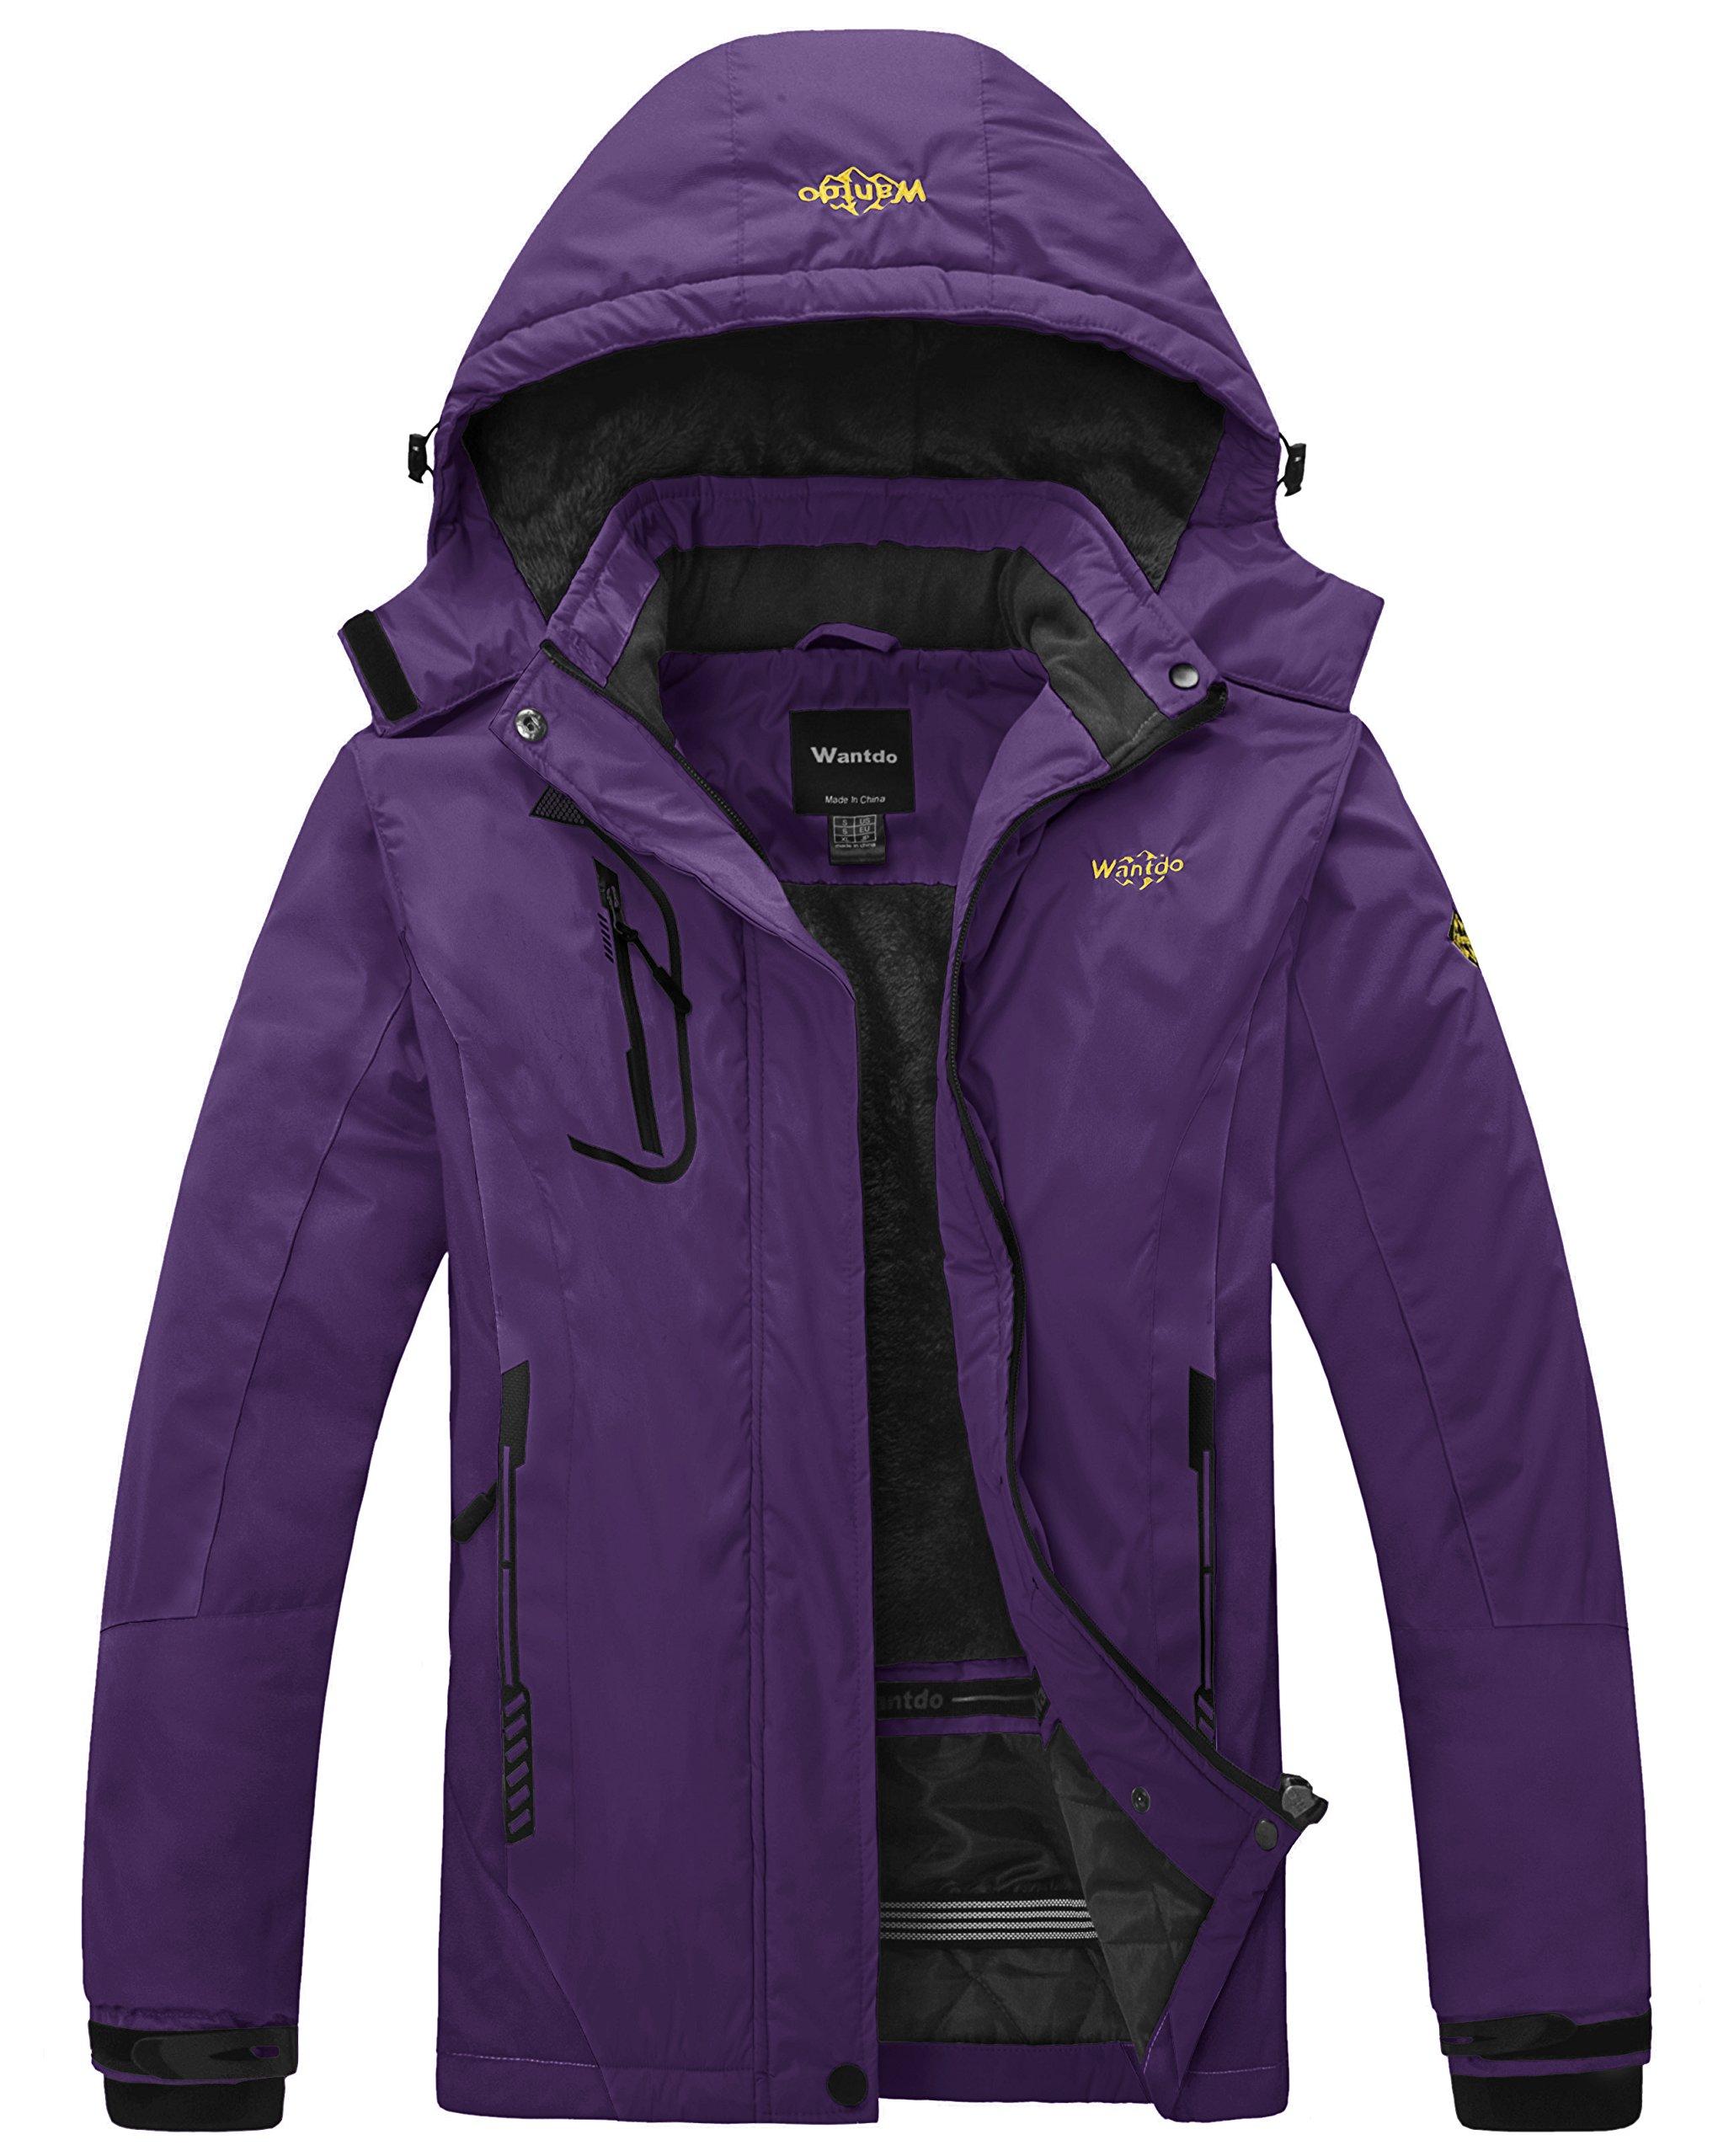 Wantdo Women's Waterproof Mountain Jacket Fleece Windproof Ski Jacket Outdoor Jacket (US S) Dark Purple